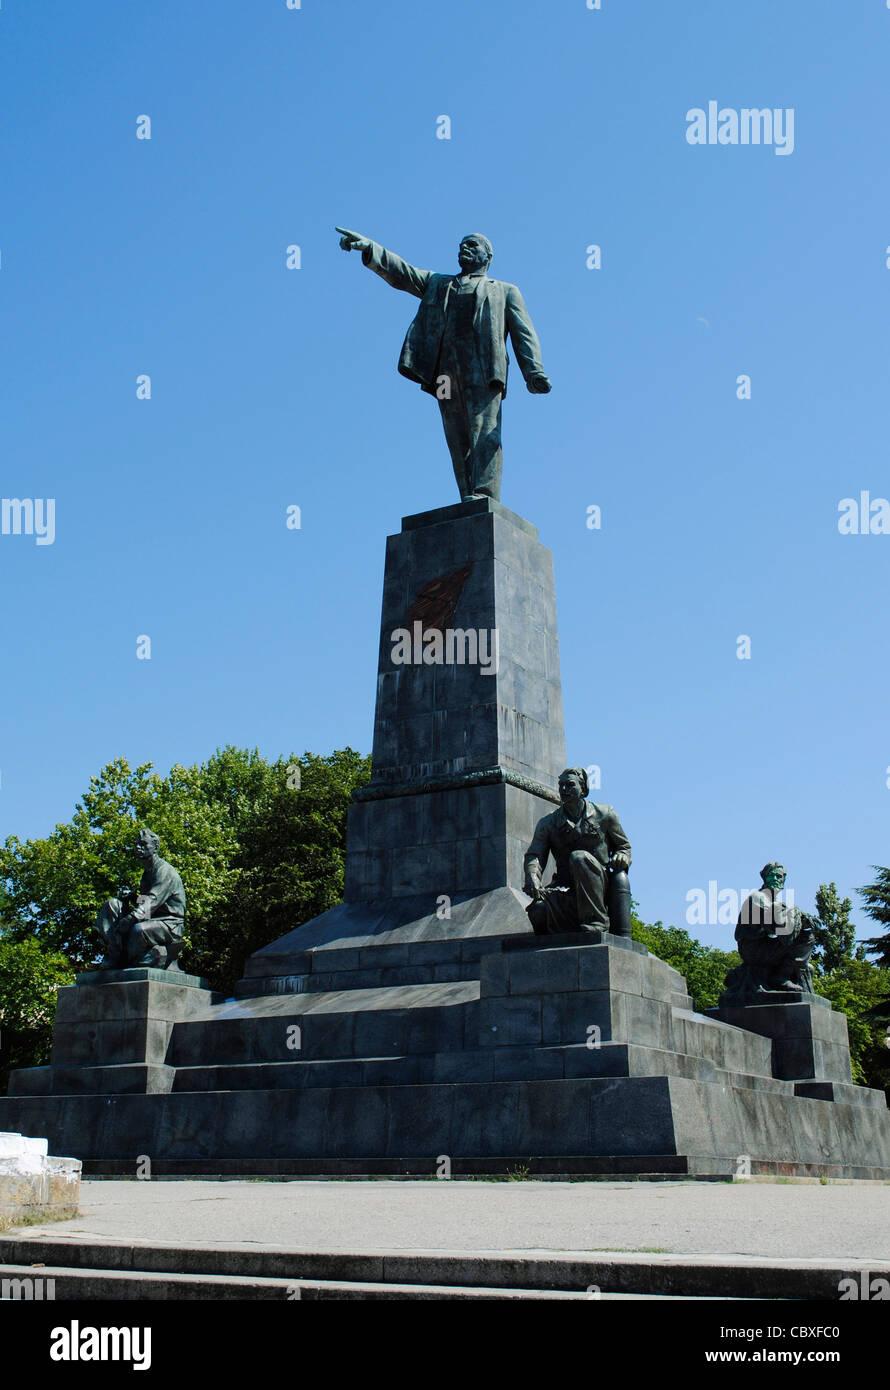 Vladislav Galkin will be erected a monument 11.03.2010 20